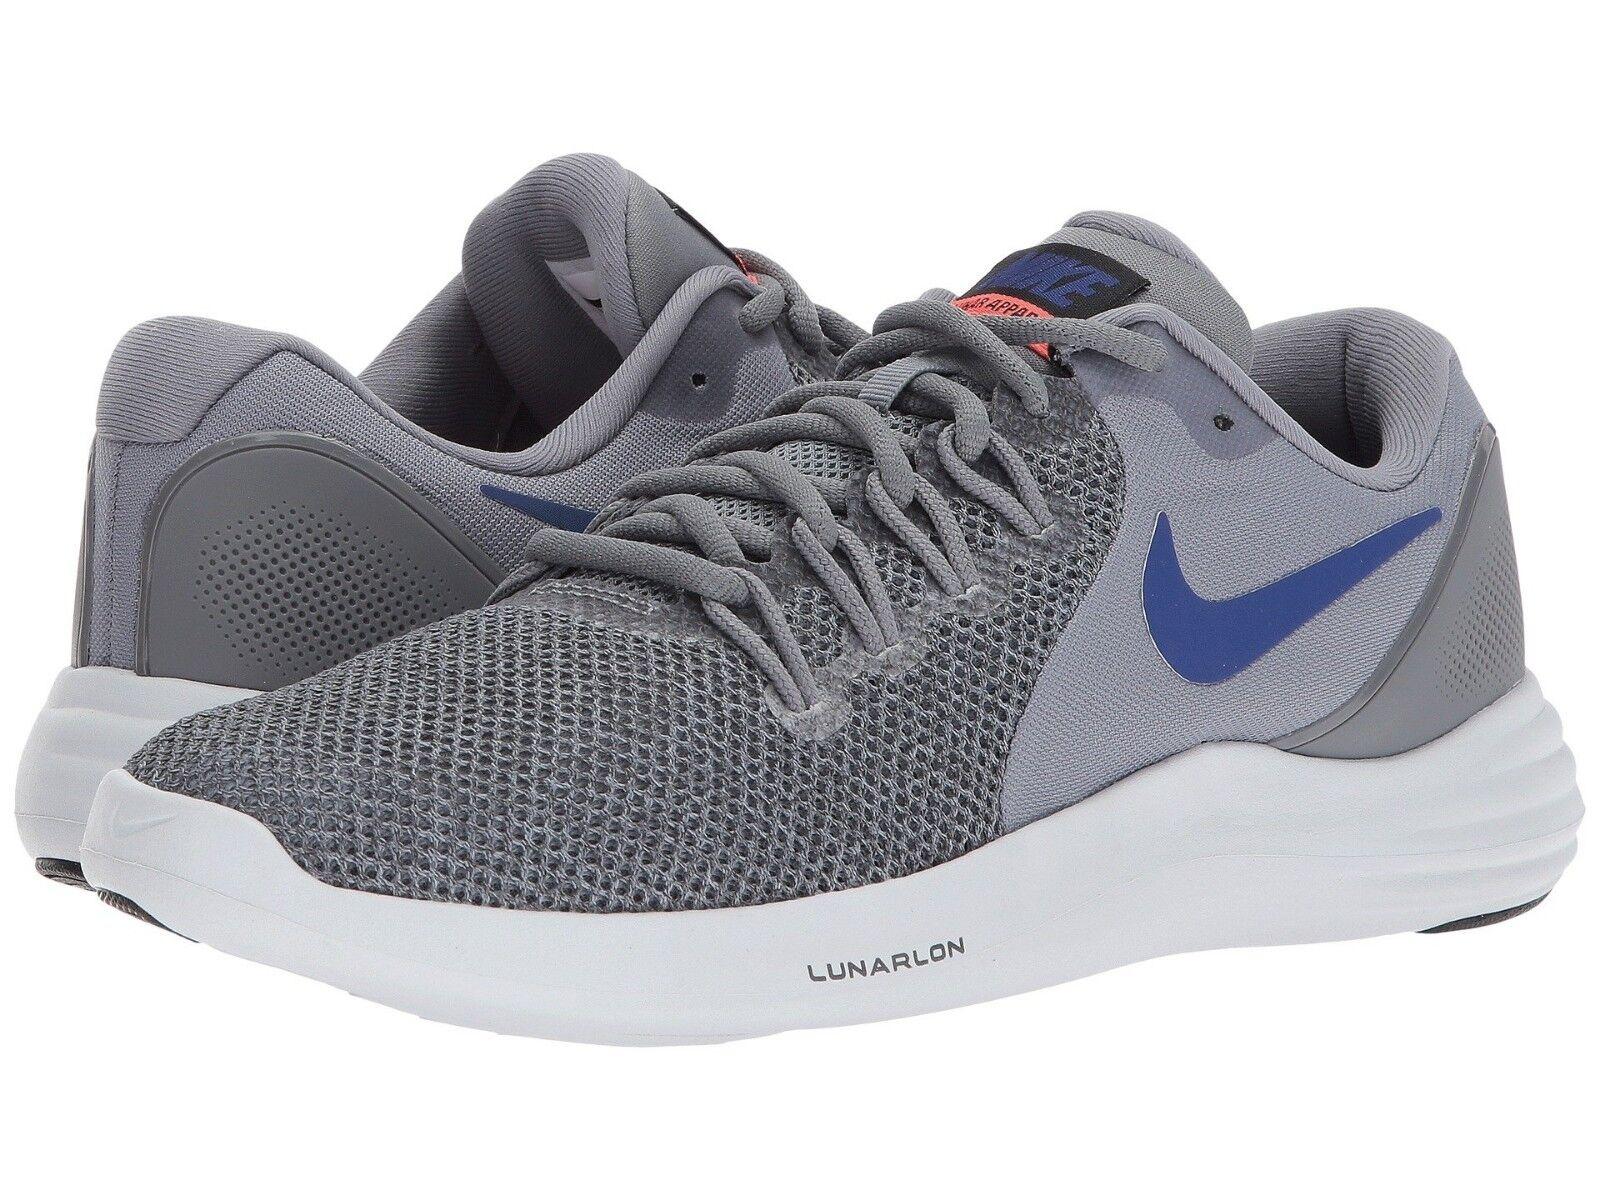 Men's Nike Sizes Lunar Apparent Running Shoes, 908987 005 Multi Sizes Nike Cool Grey/R Blue 489d2c